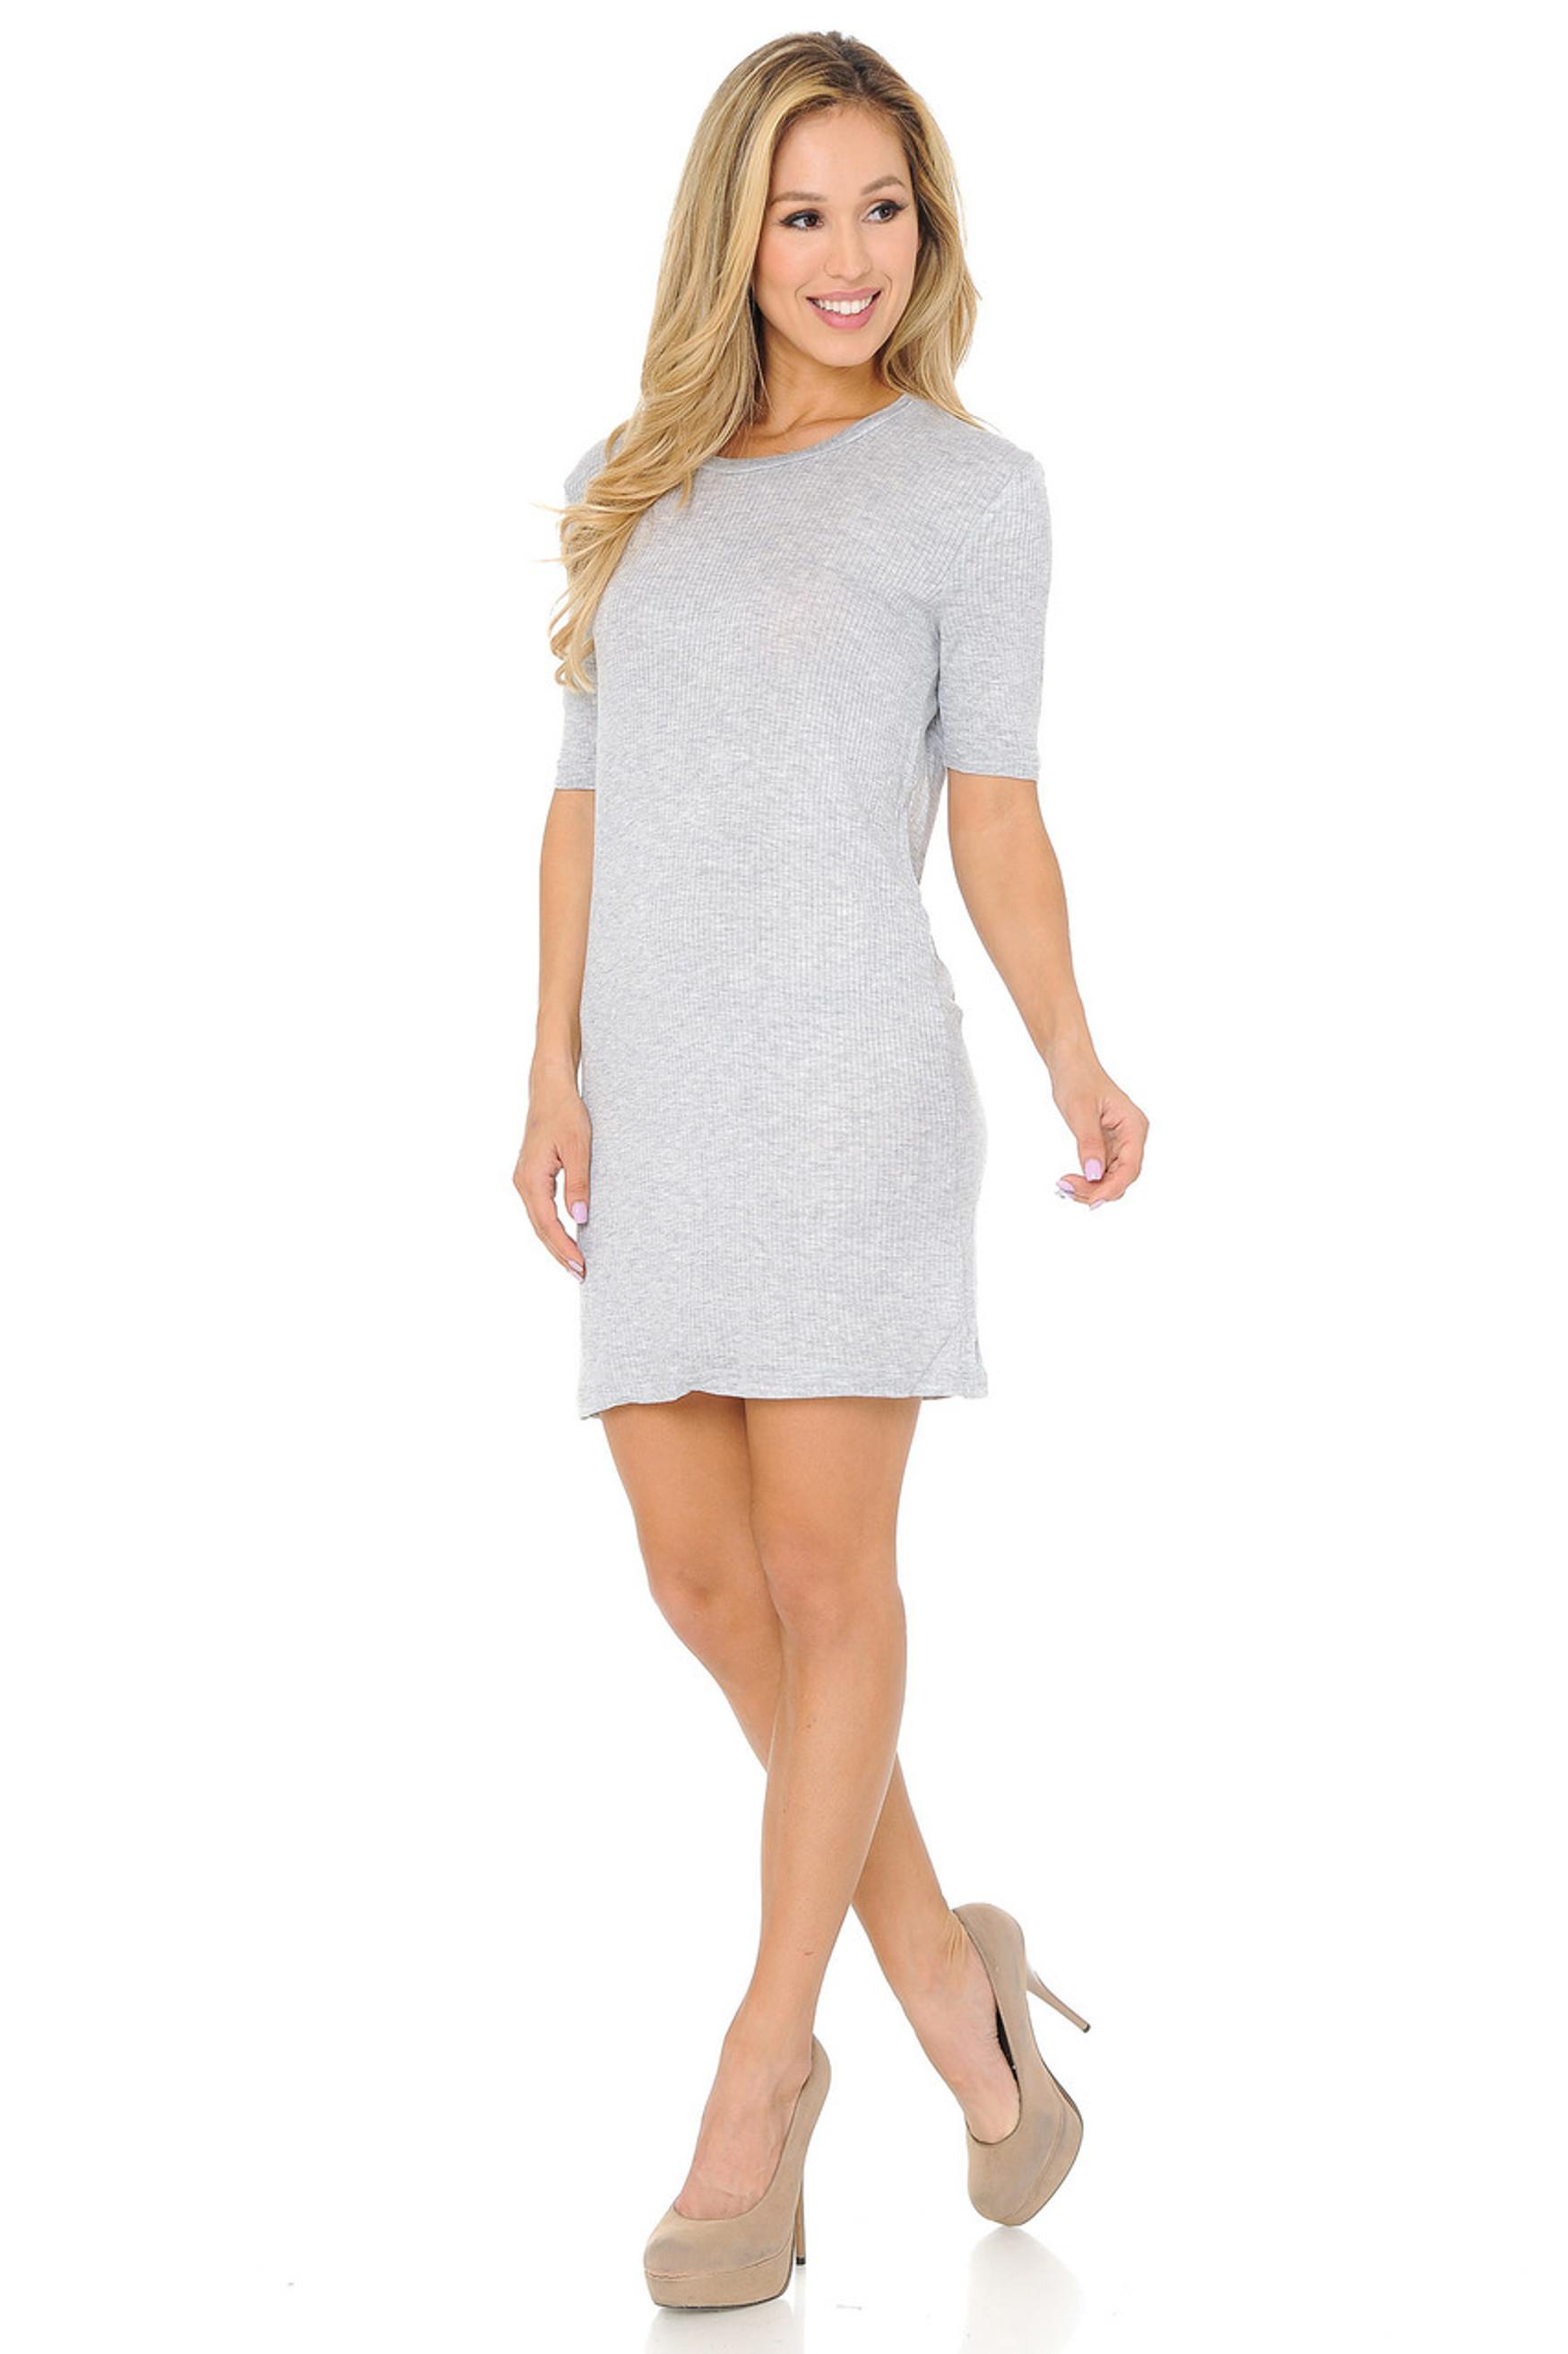 Lightweight Rayon Any Day Solid Basic Midi Dress